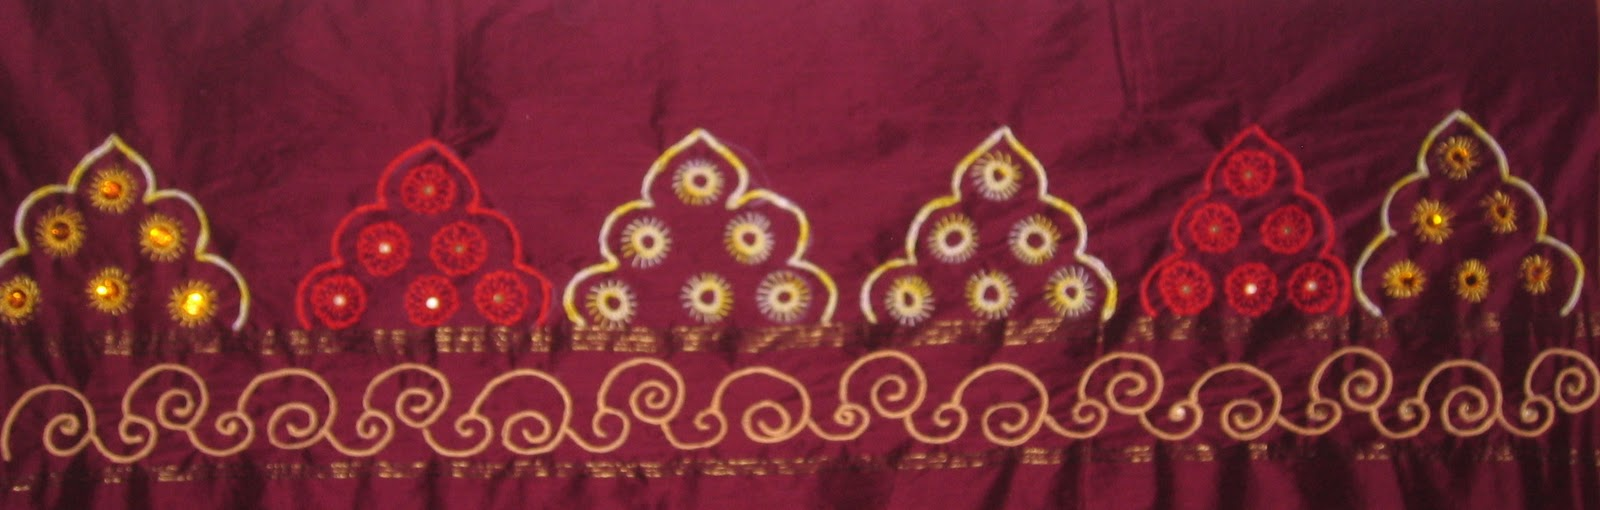 Saree broder embroidery designs